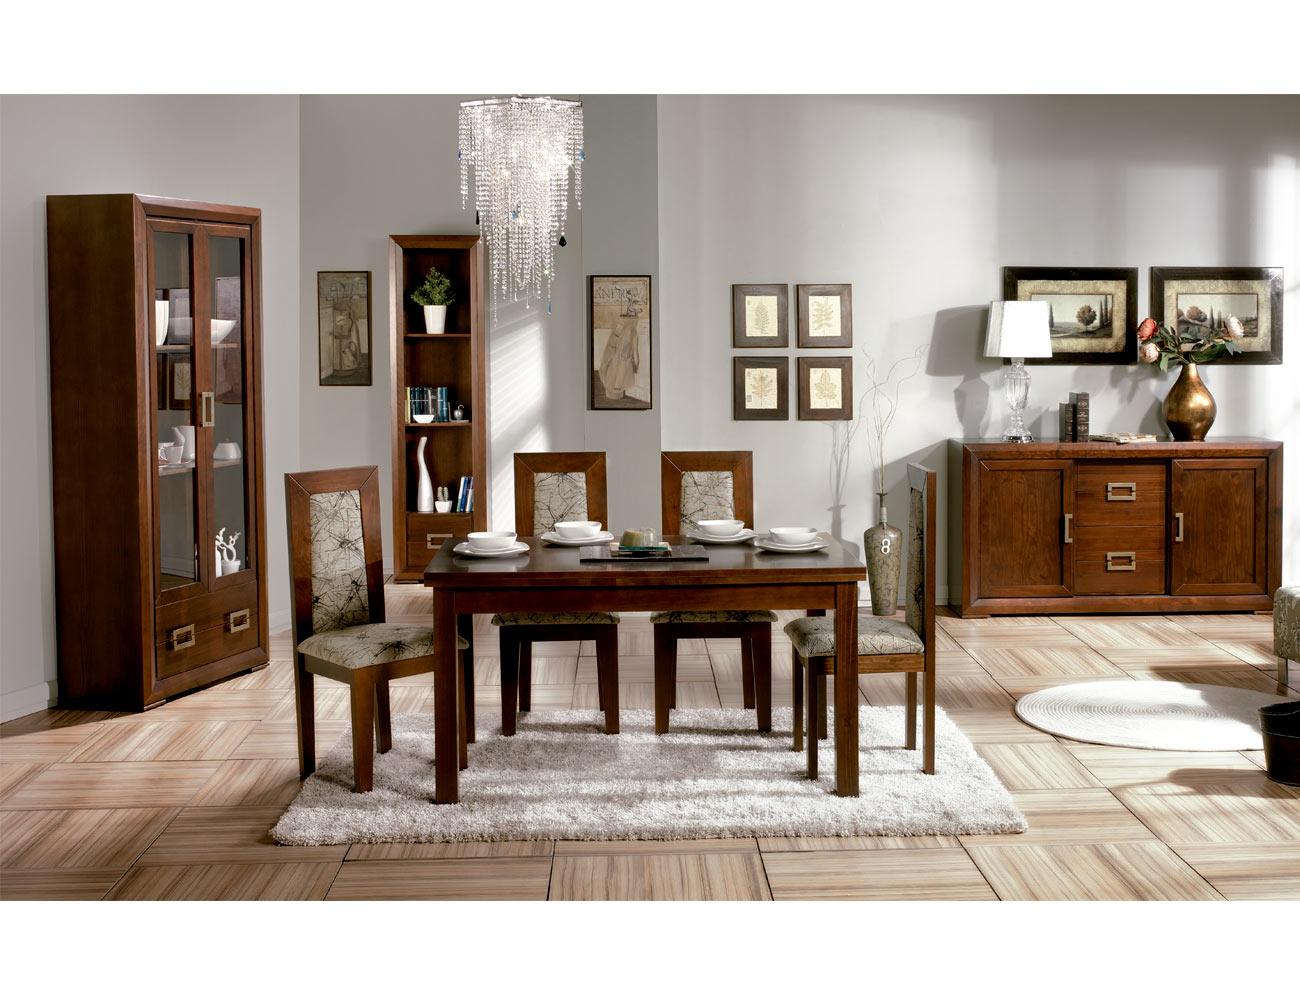 Composicion34 mueble salon comedor madera1